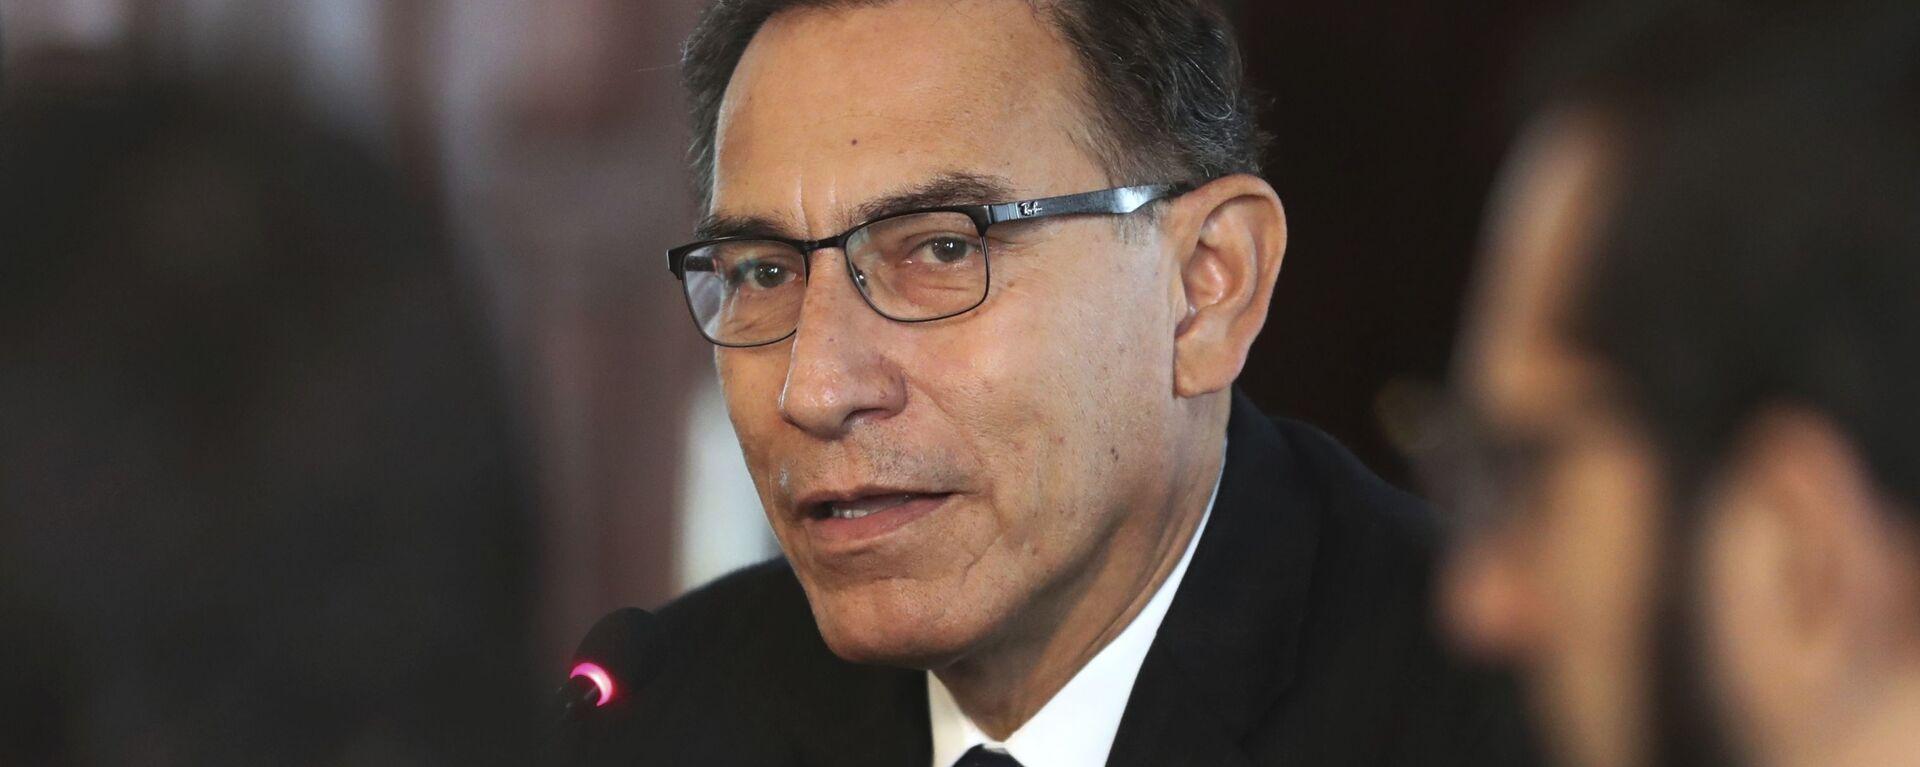 Martín Vizcarra, presidente de Perú - Sputnik Mundo, 1920, 13.02.2021